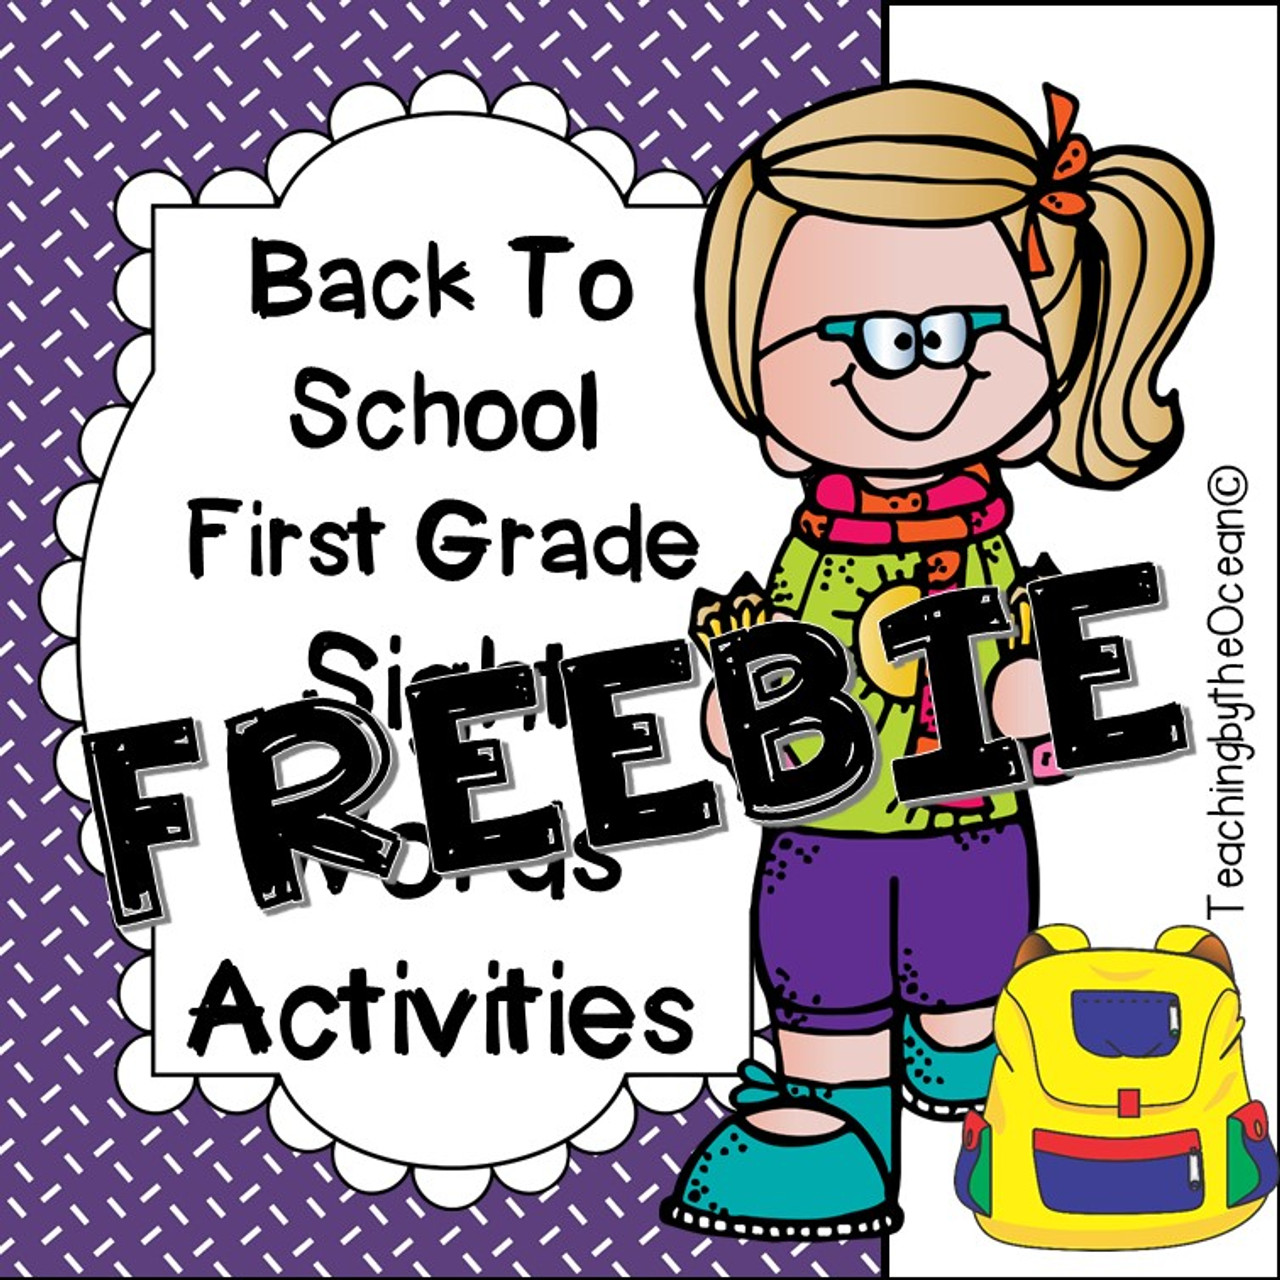 medium resolution of First Grade Sight Words Activities - Back to School Themed FREEBI